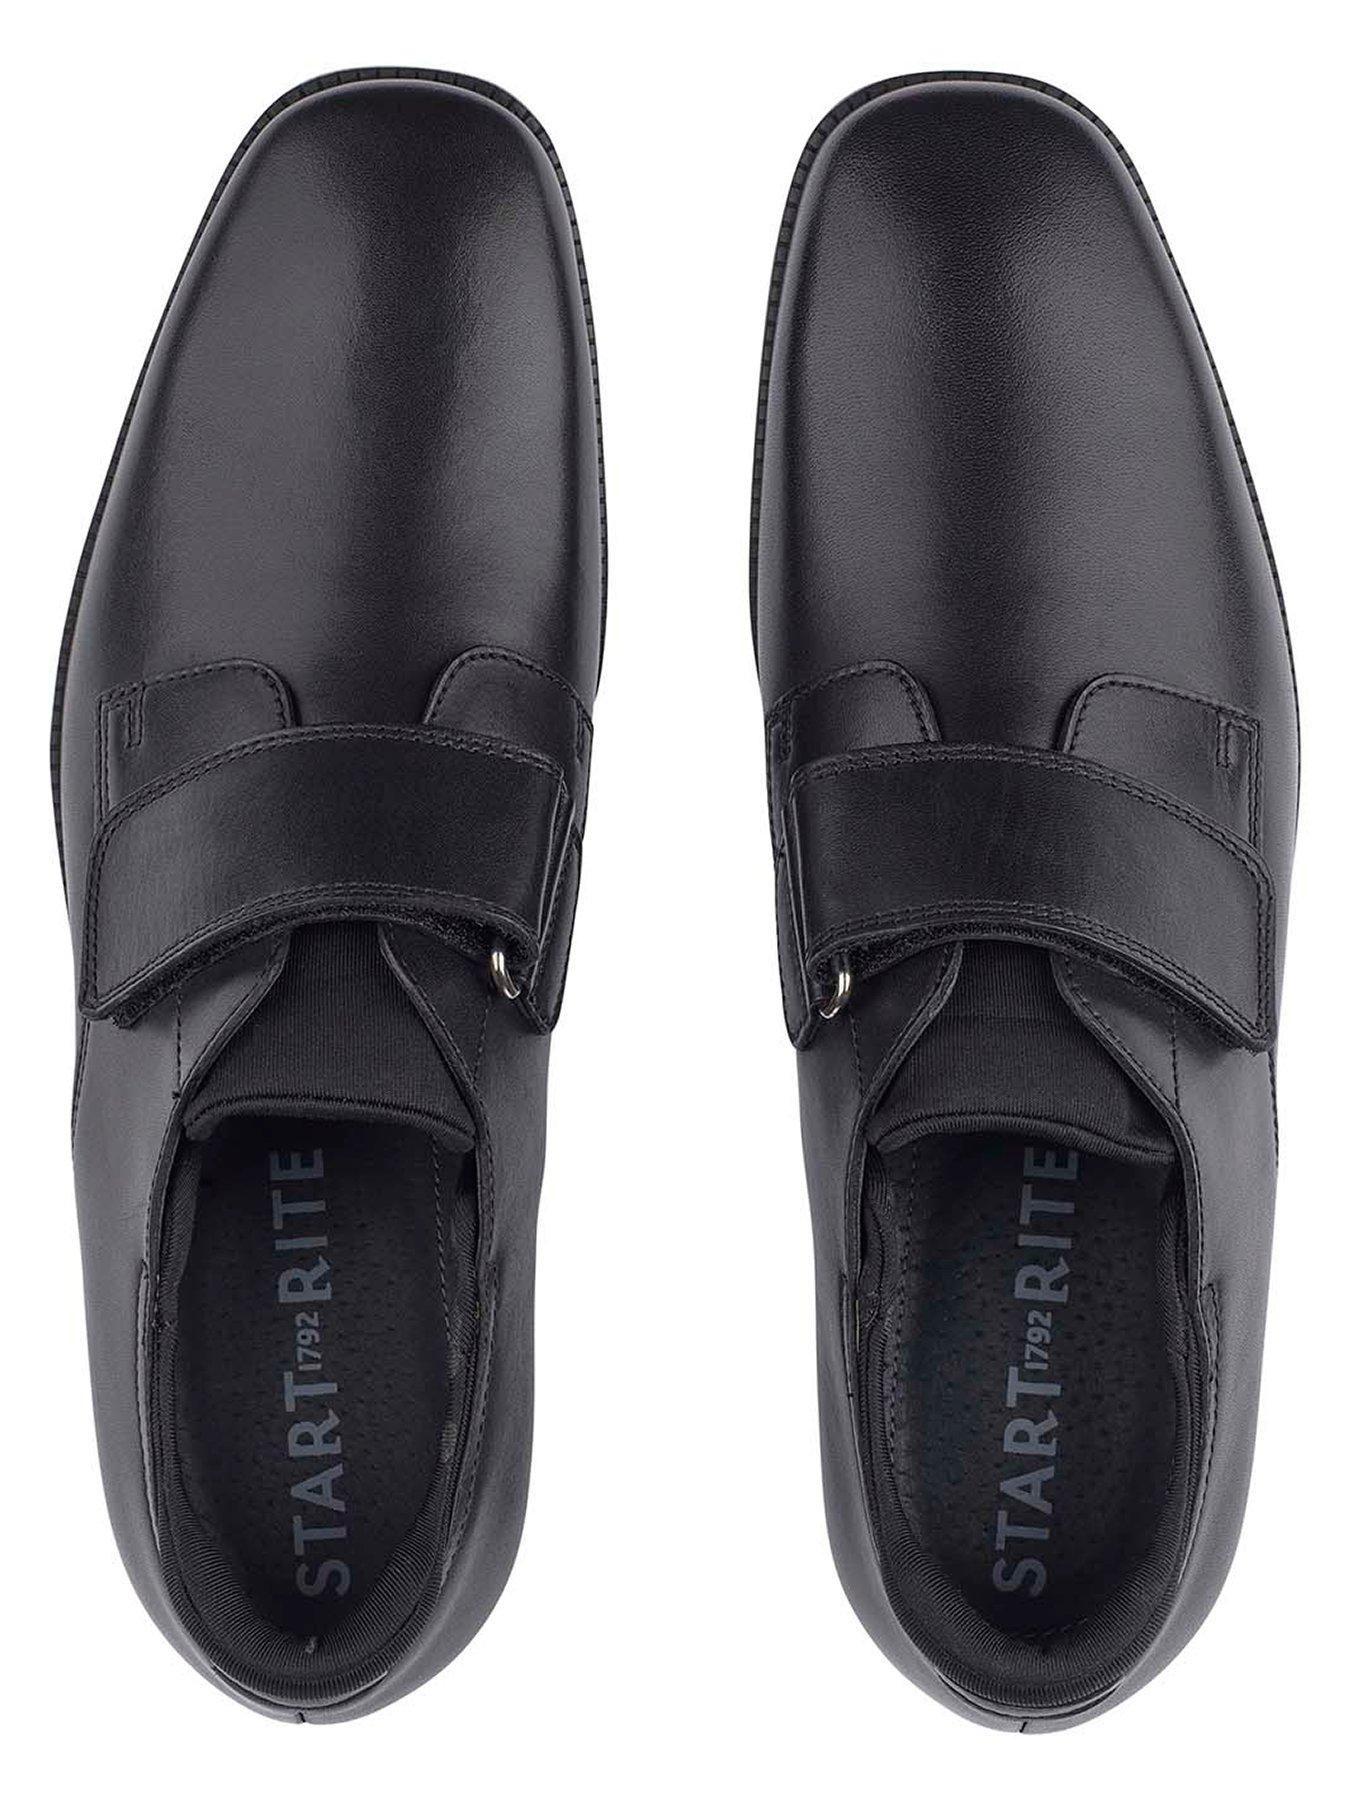 boys school shoes size 5.5 order 887b7